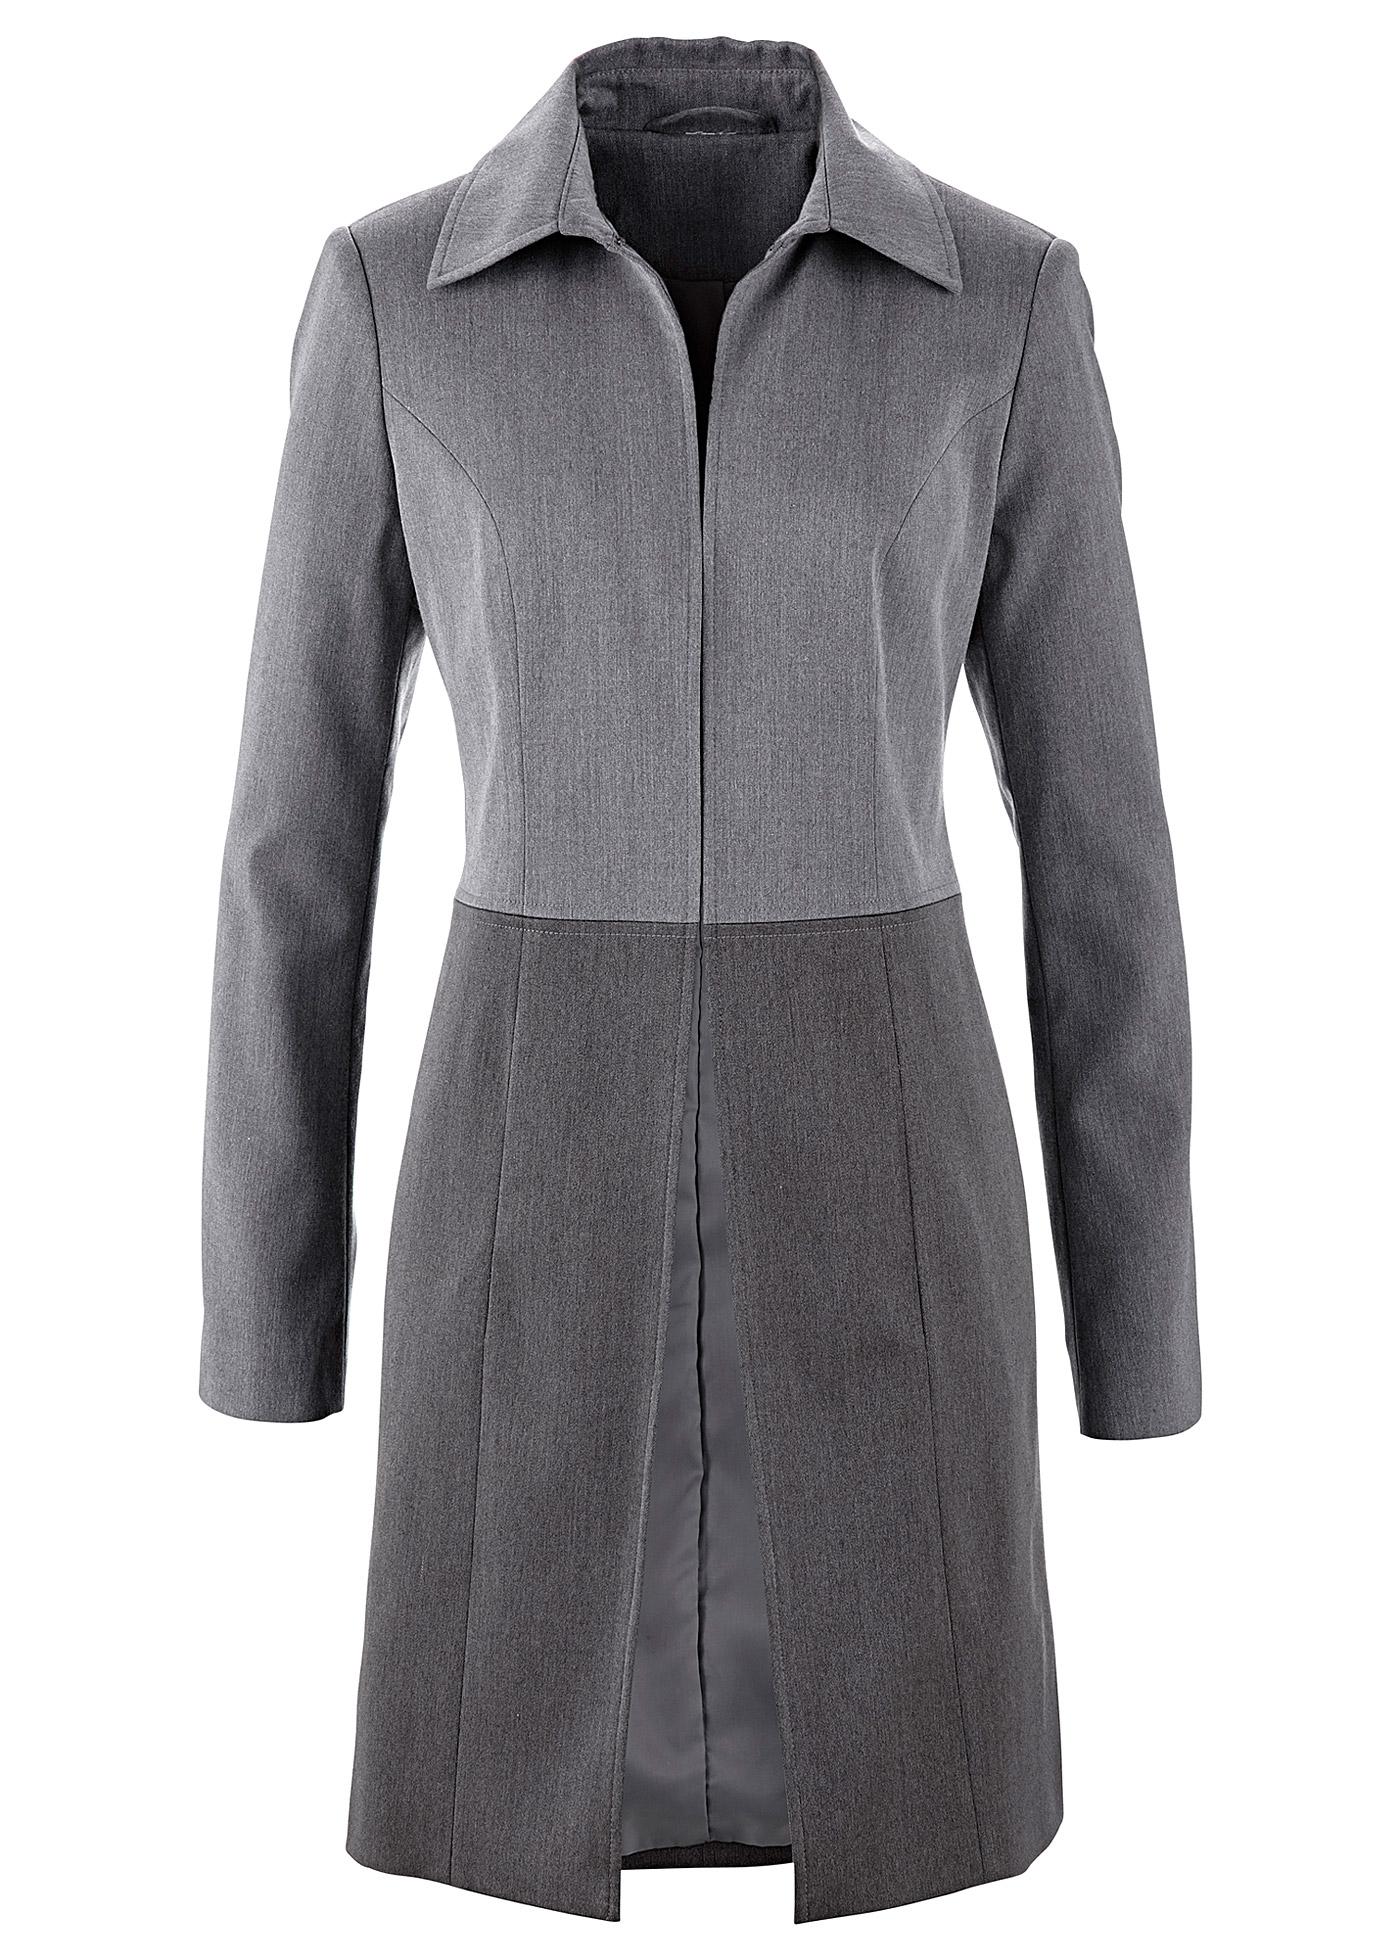 Casaco - blazer cinza manga longa